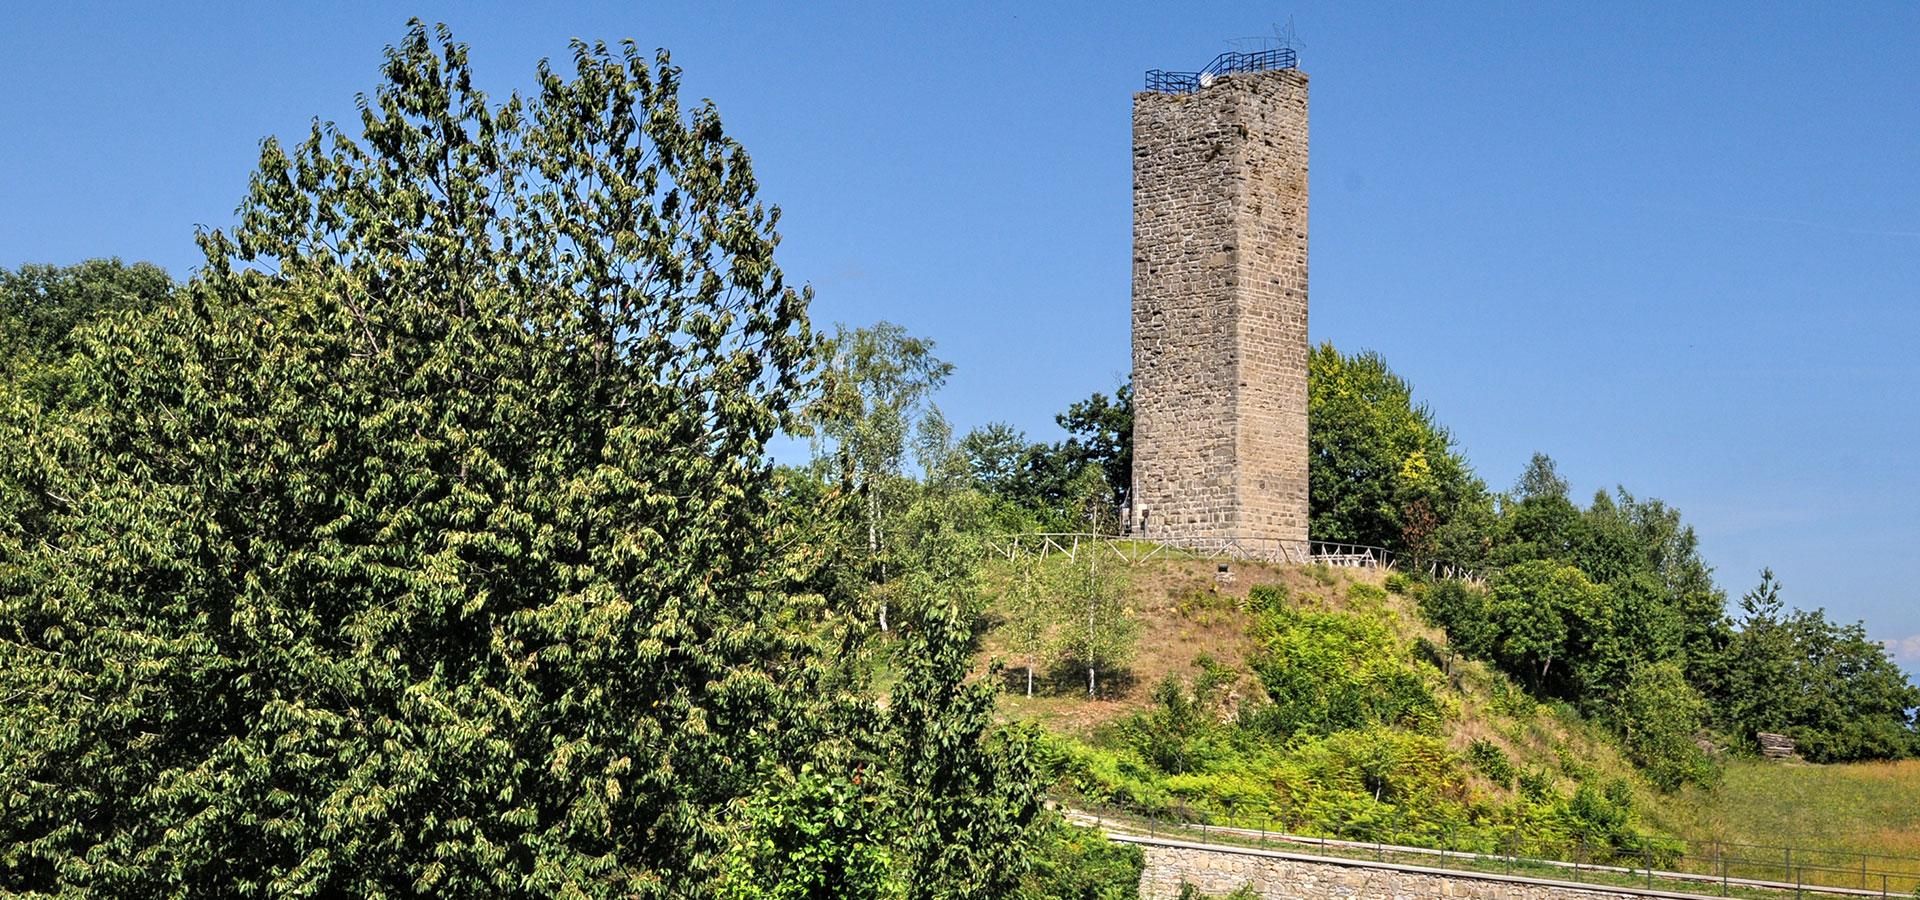 torre-castelnuovo-di-ceva-3